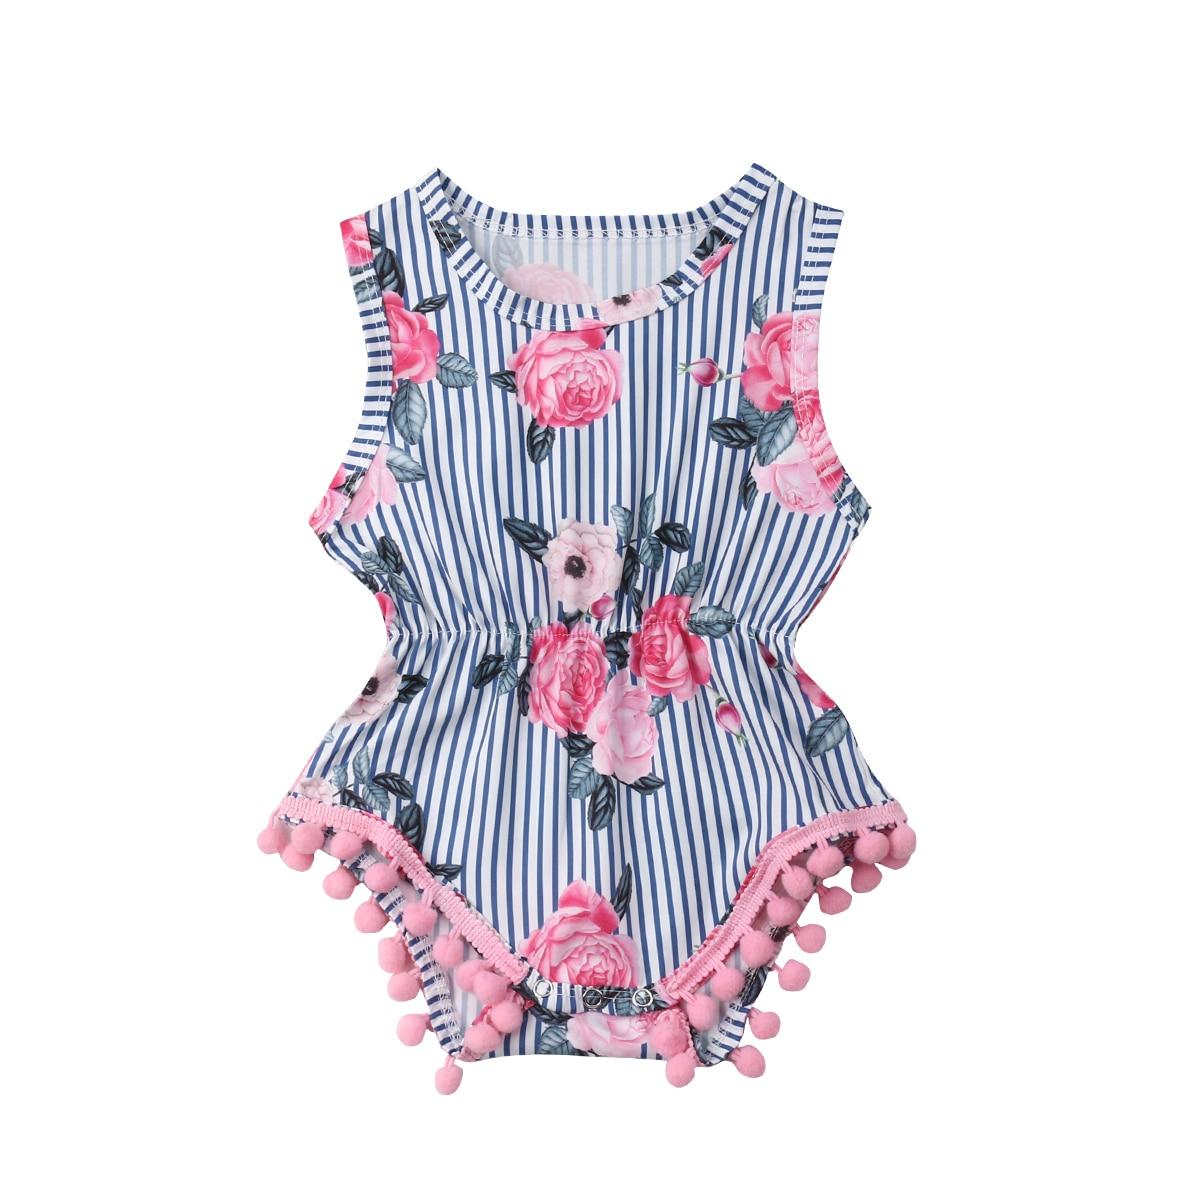 d03306bff90 2019 Newest Style Warehouse Price Newborn Infant Baby Adorable Girl Summer  Floral Romper Jumpsuit Tassel Sunsuit Clothes 0-18M ~ Hot Deal June 2019